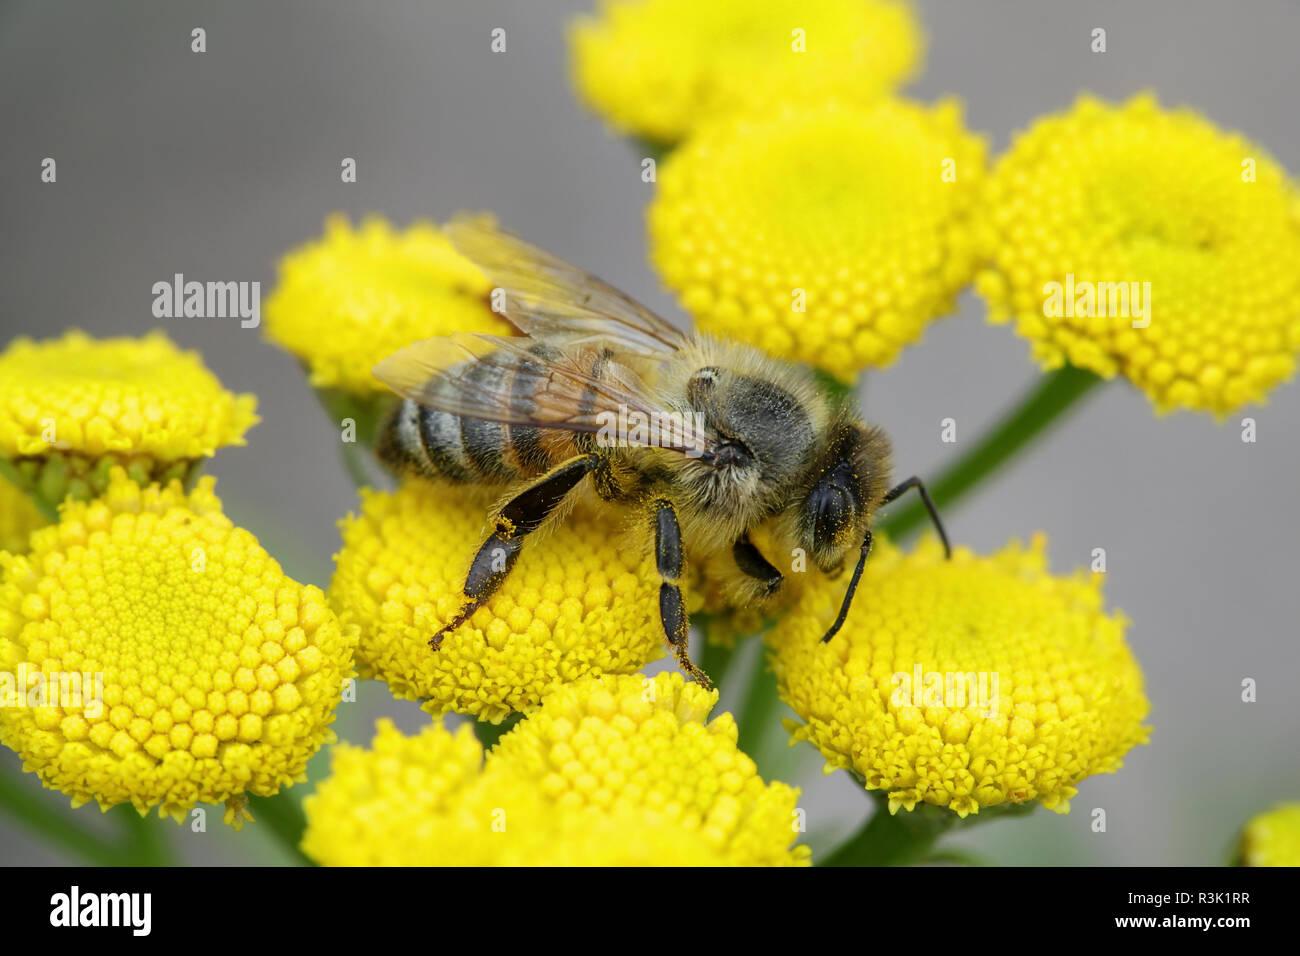 Honey bee, Apis mellifera, important pollinator - Stock Image